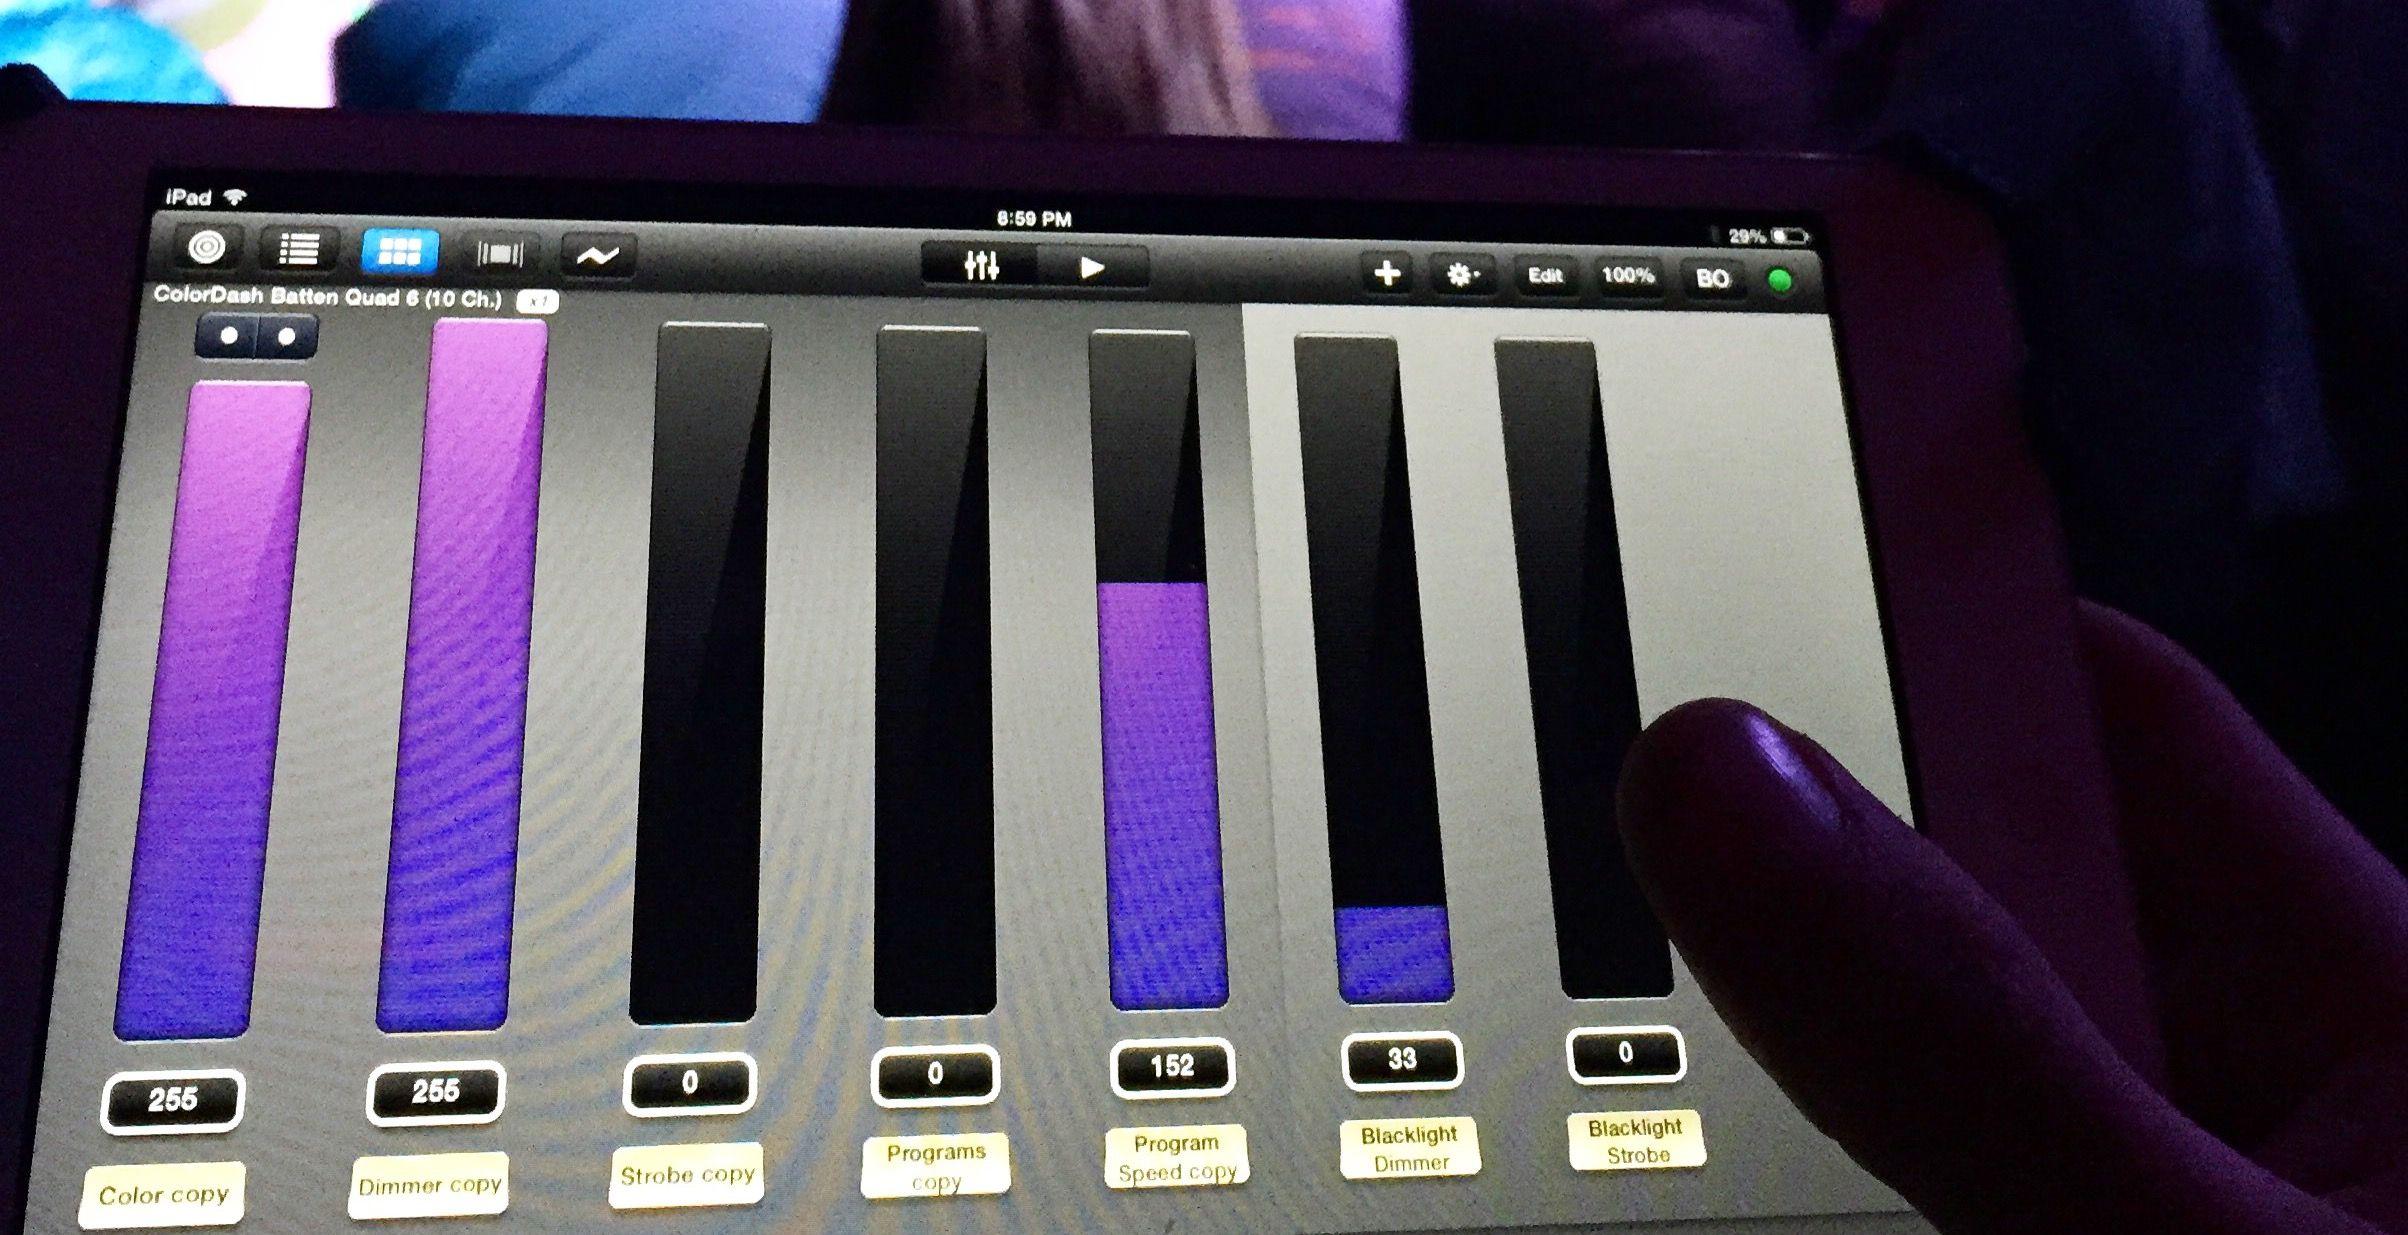 iPad lighting control panel